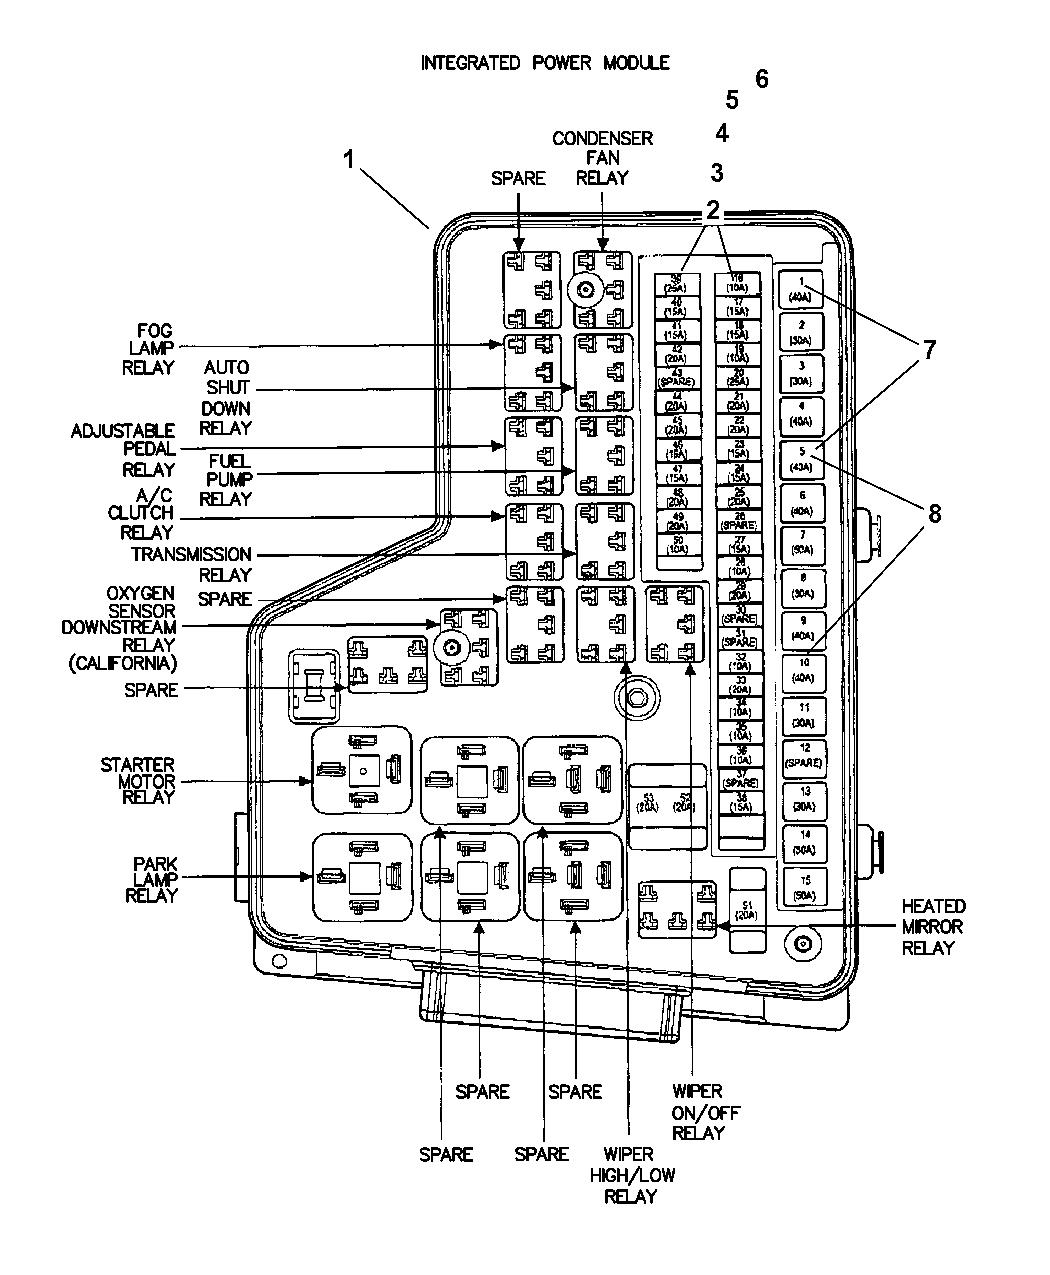 2007 Dodge Ram 1500 Power Distribution Center  Fuses  U0026 Relays